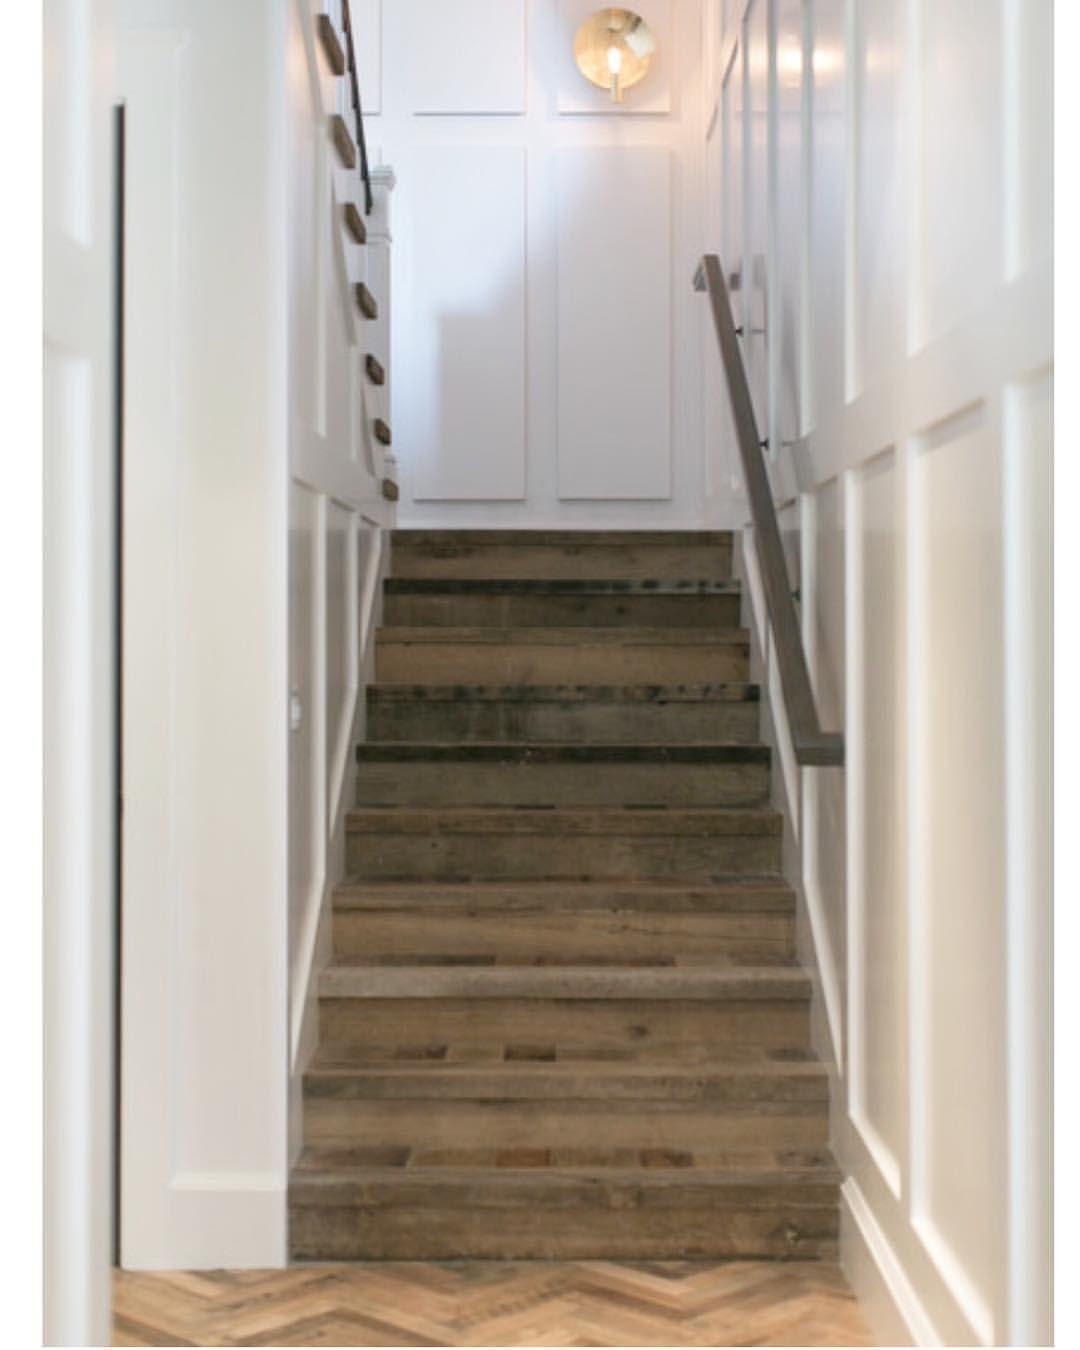 Vintage wood meets pristine white millwork... We think it's a match made in heaven.  #BWD #stairwell #customhome #vintagehardwood #millwork #paneling @arteriorshome @legacycdm #cynthiachilds #herringbonefloor